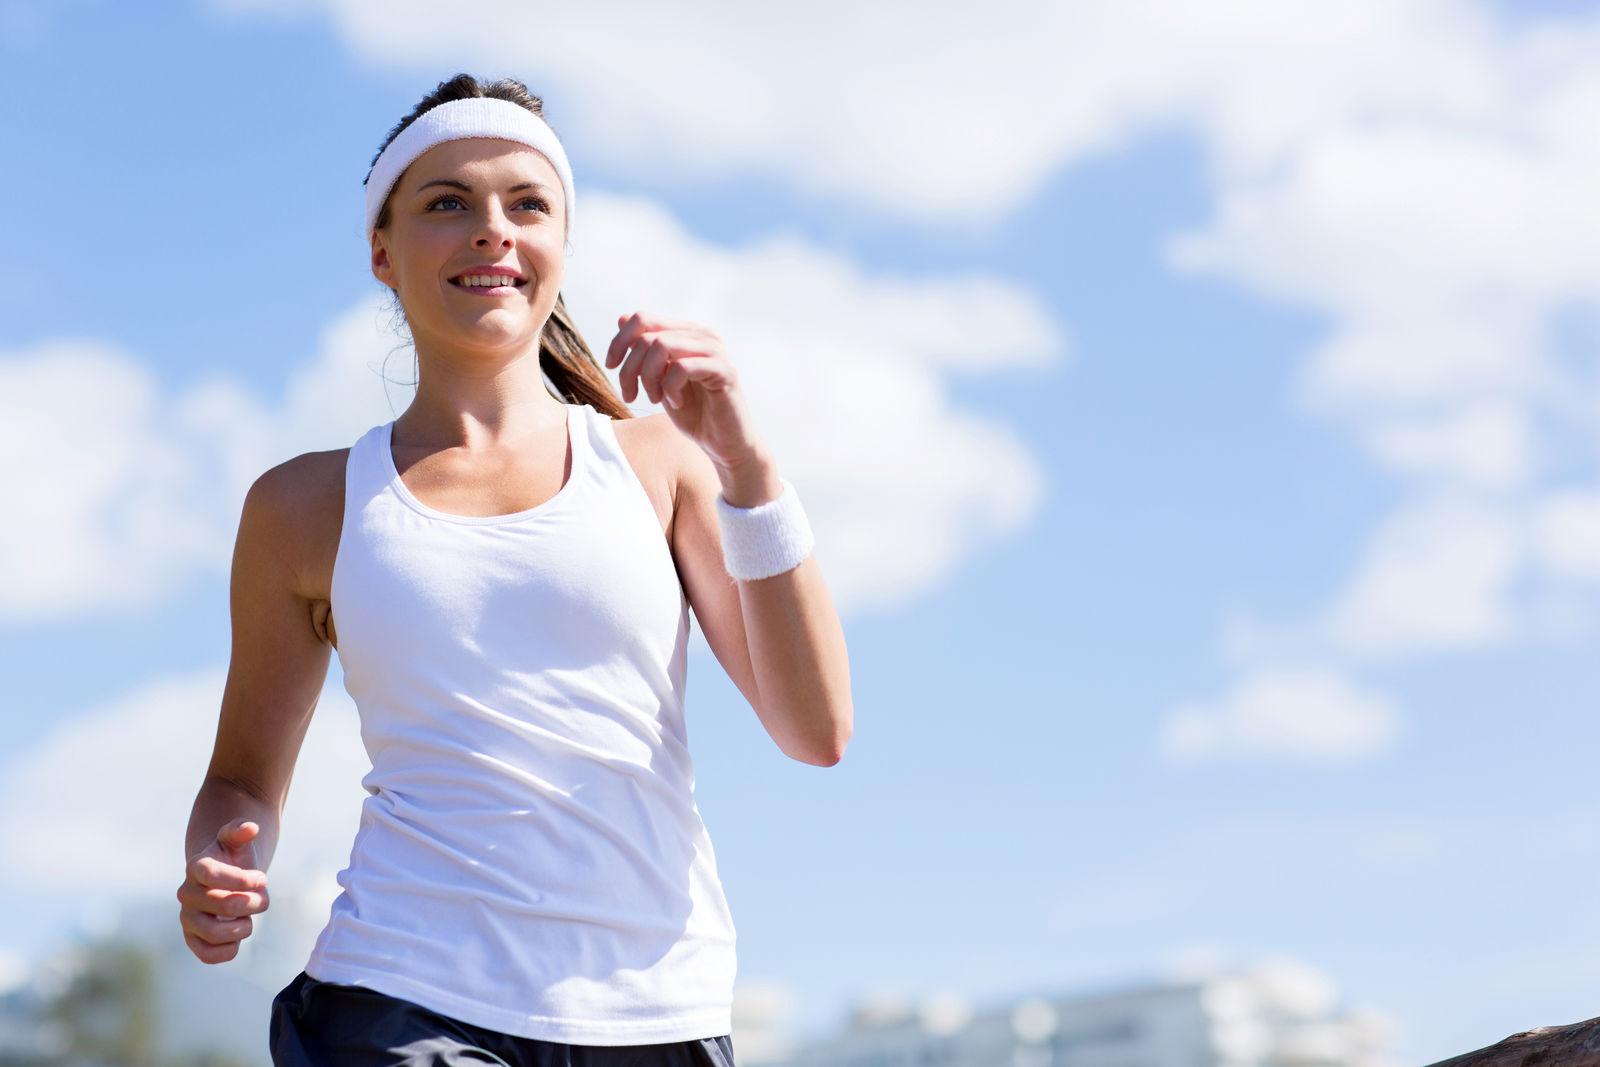 Personal Trainer for Marathon Training